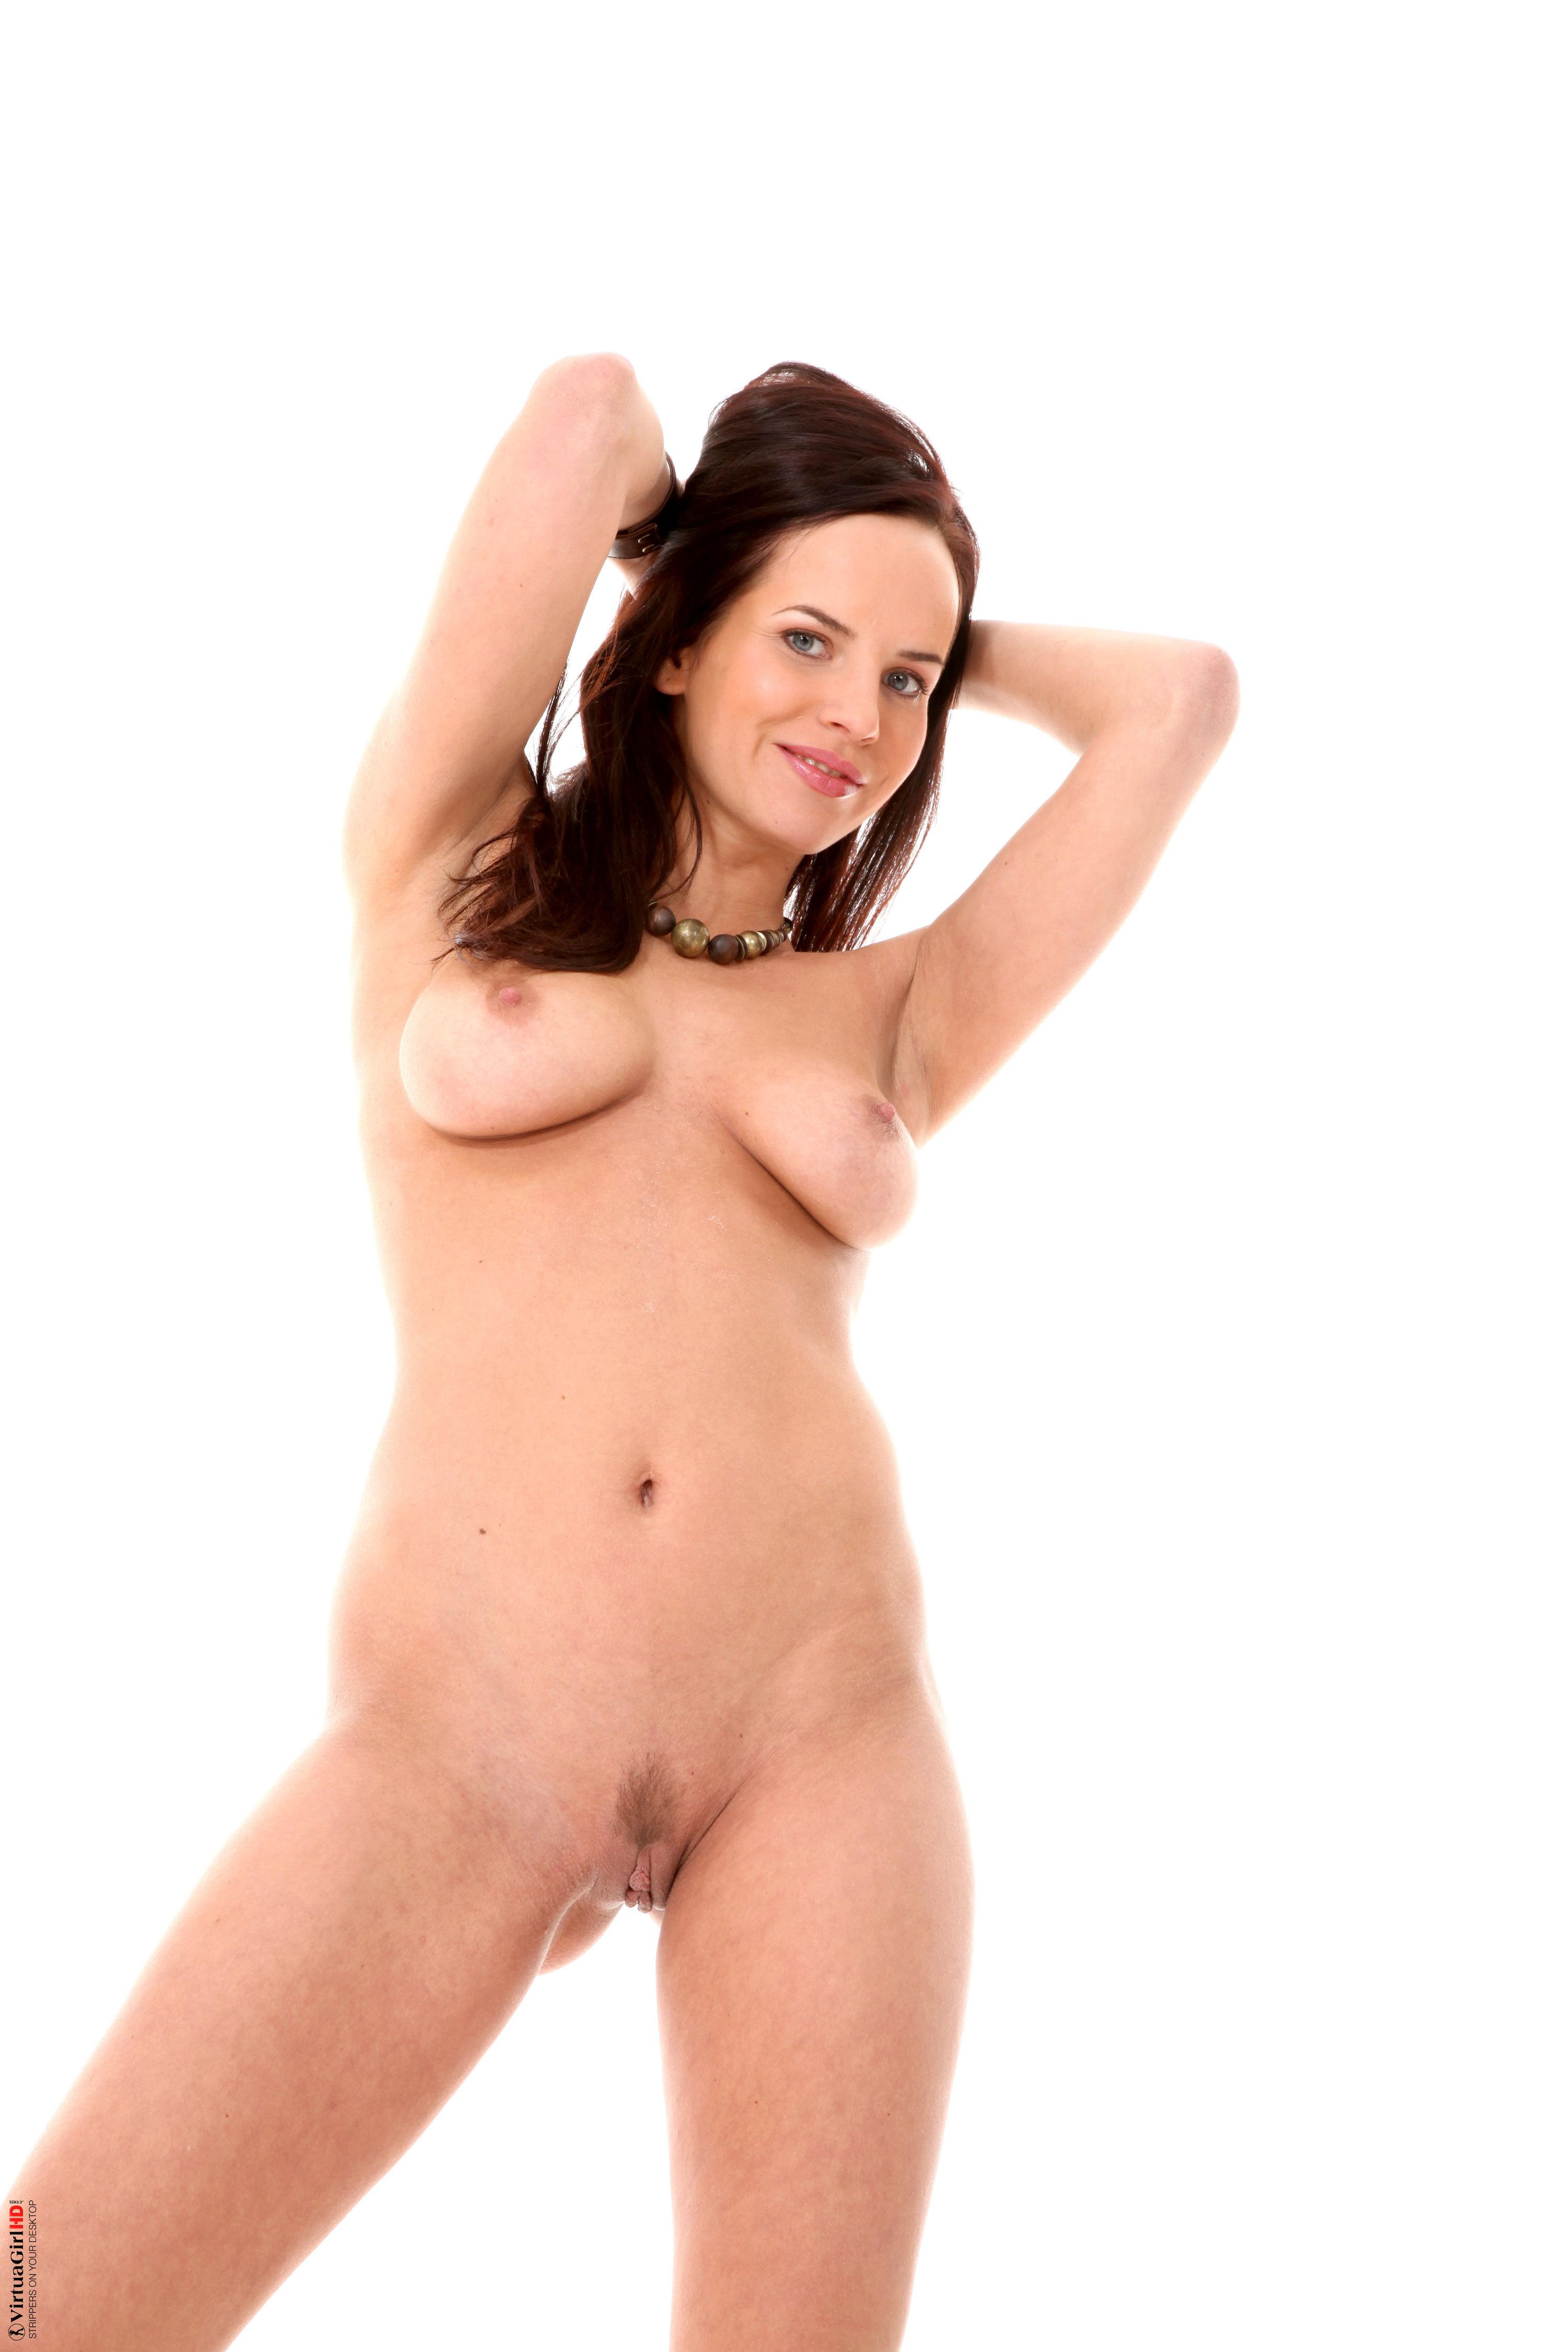 nude model wallpaper